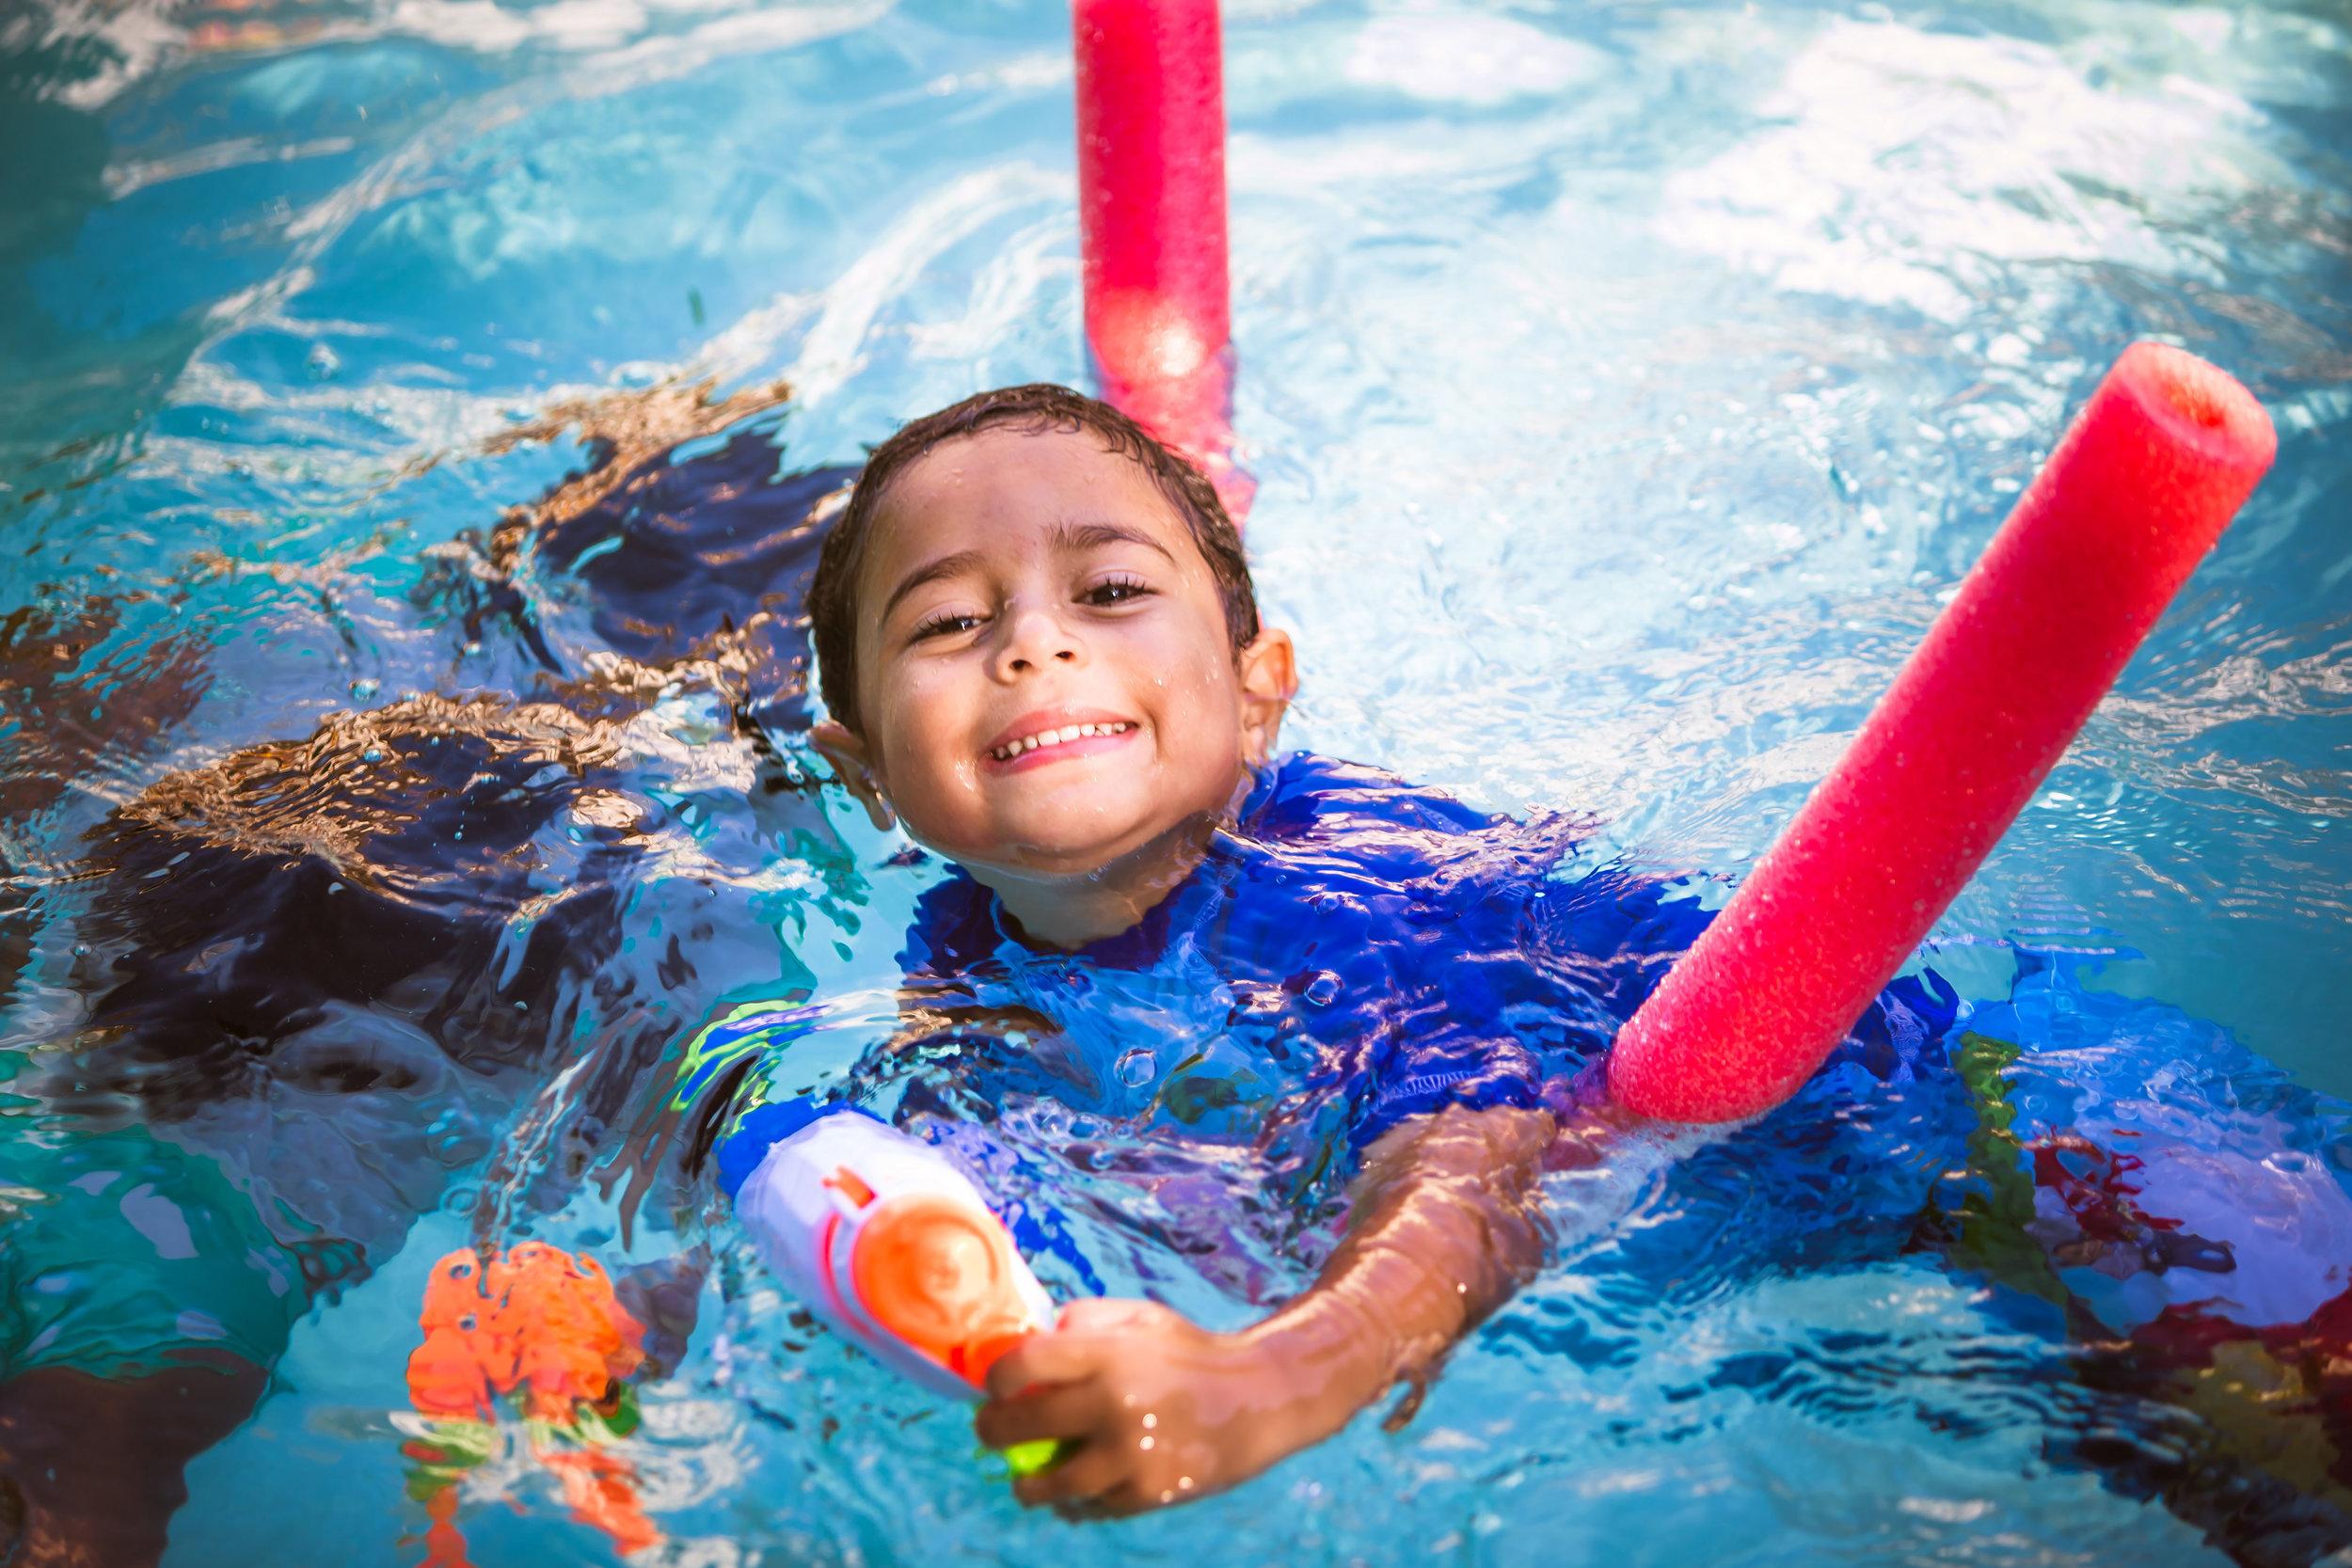 Newburyport Kids Birthday Photographer   Stephen Grant Photography